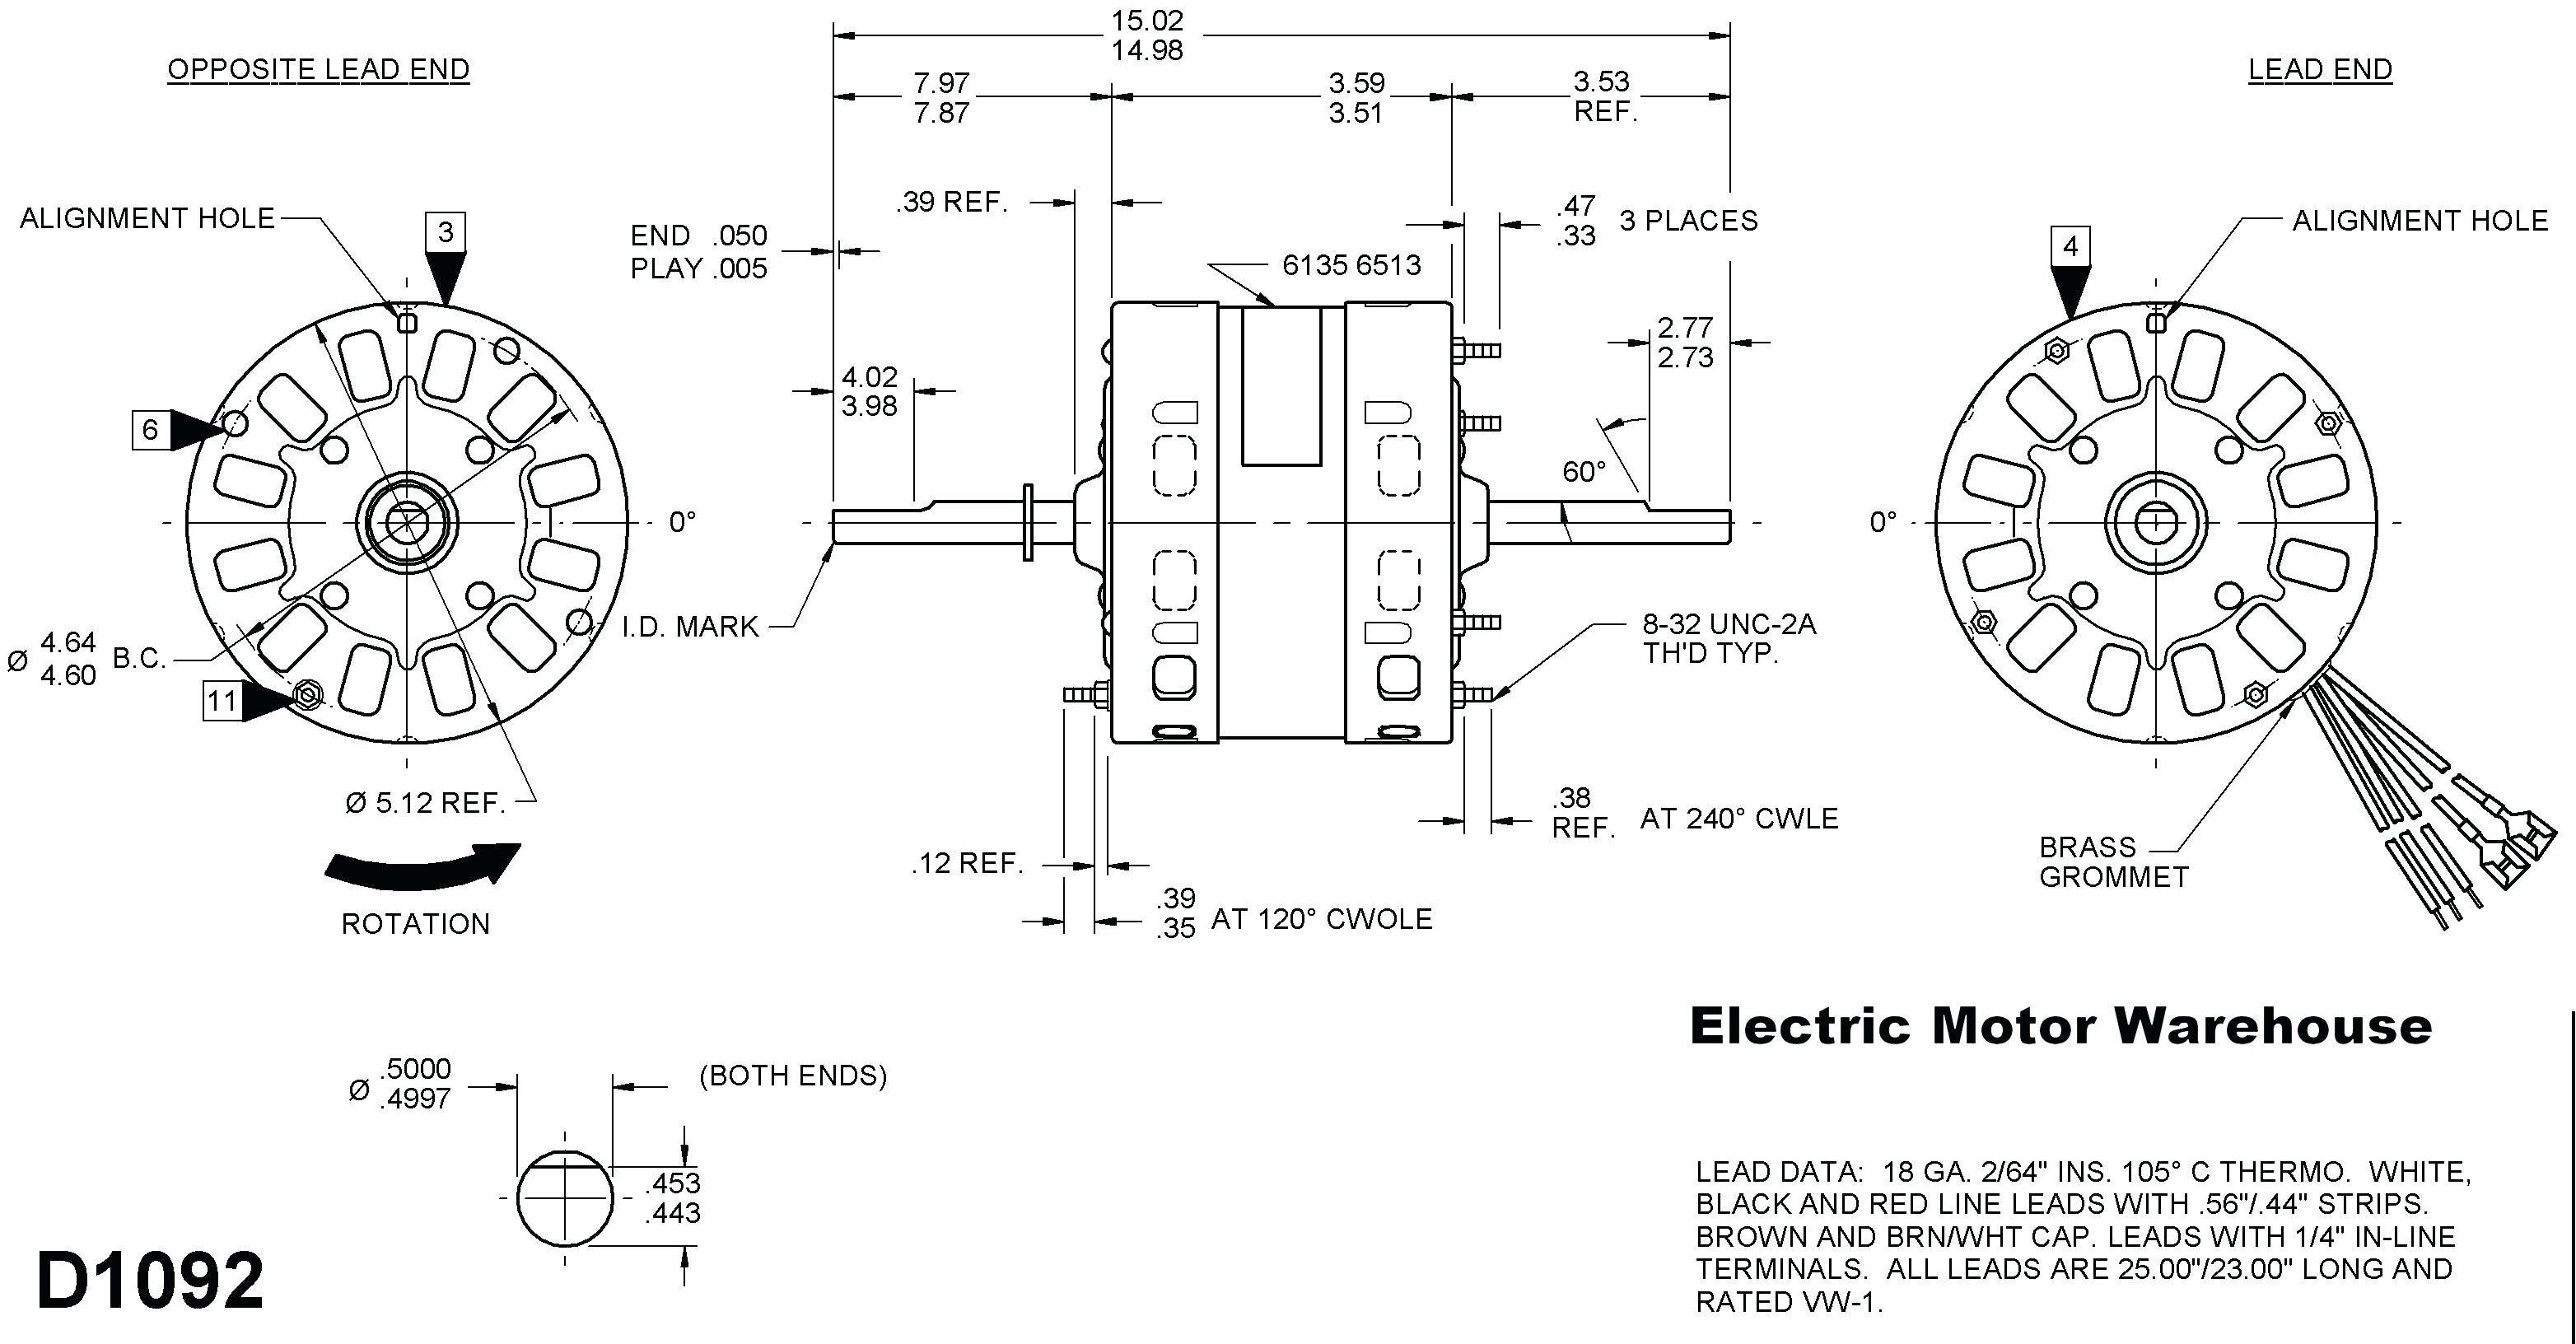 Wiring Diagram For Fasco Blower Motor : Fasco blower motor wiring diagram collection